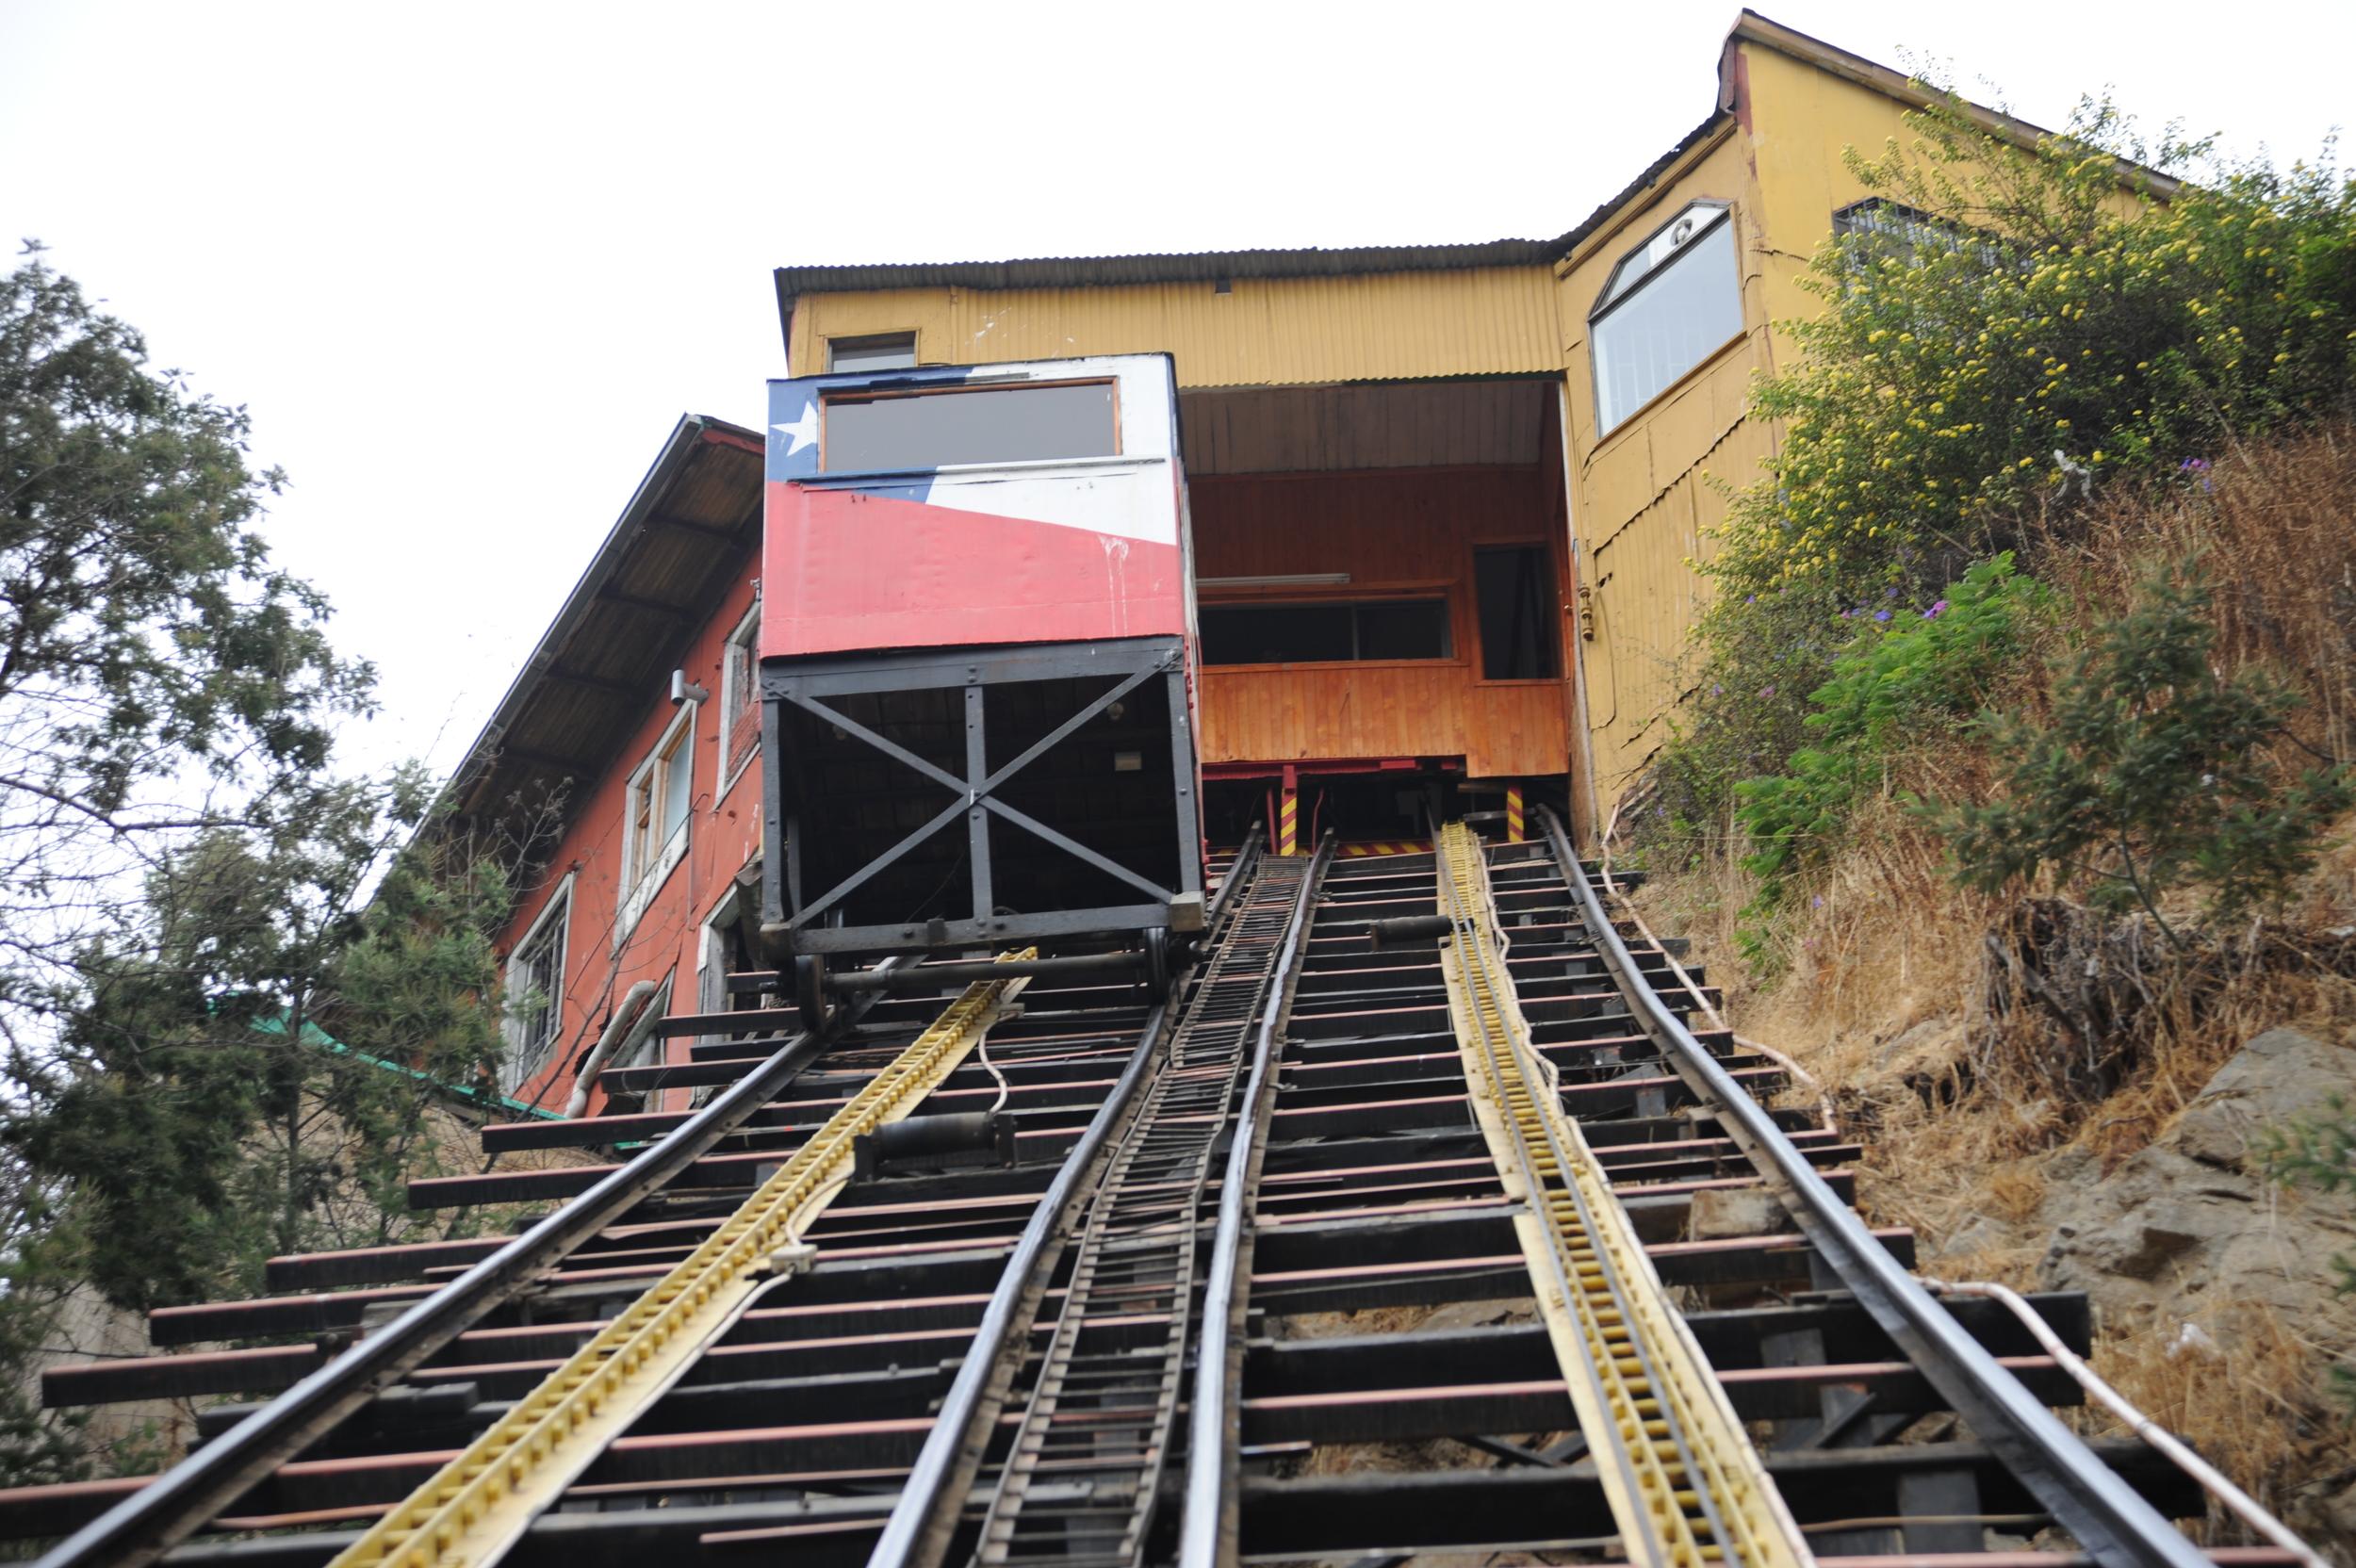 Funicular, Valparaiso, Chile, 27 Mar 2012